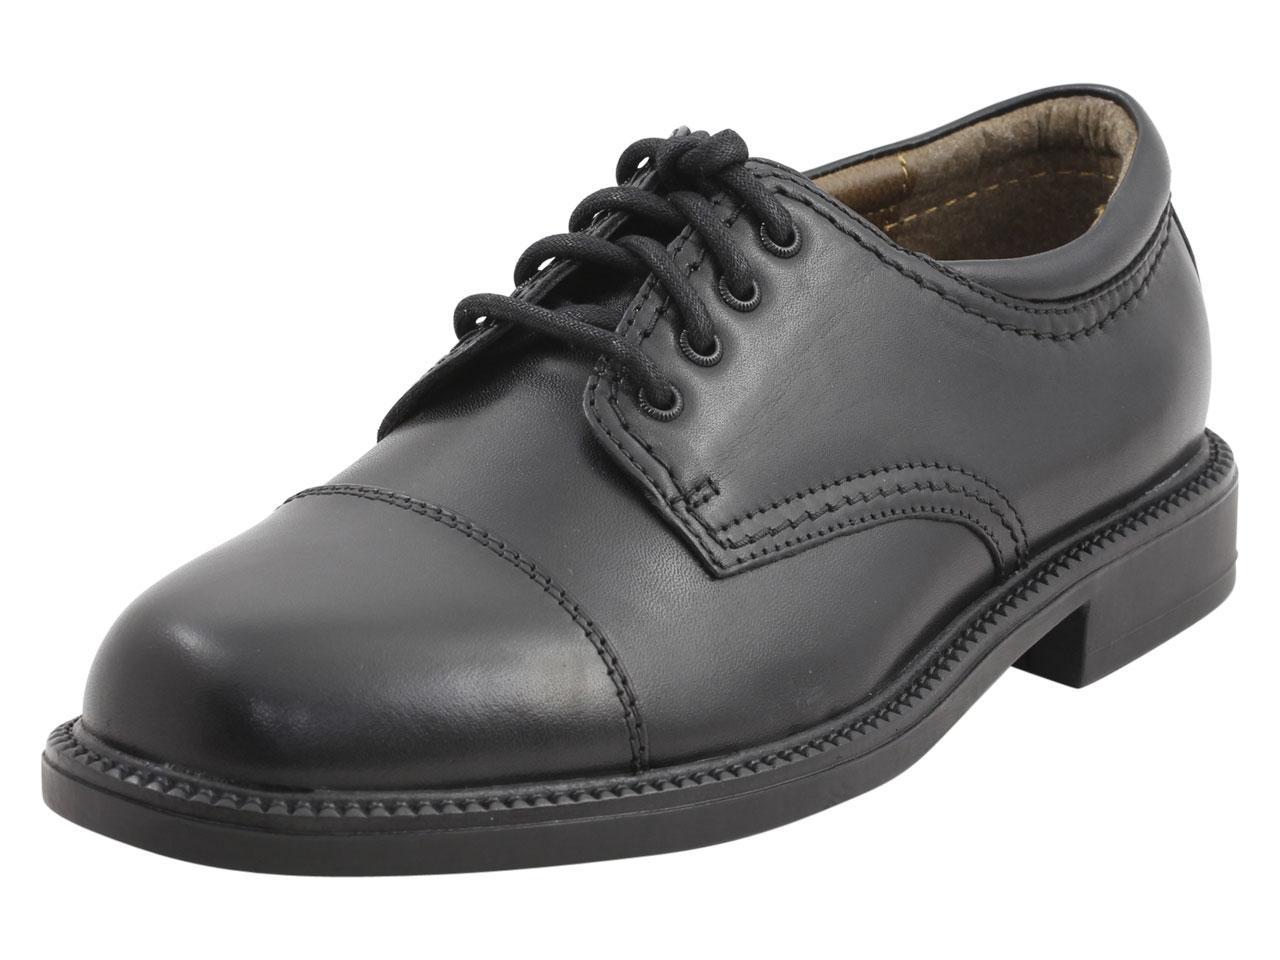 Image of Dockers Men's Gordon Cap Toe Oxfords Shoes - Black - 8.5 E(W) US